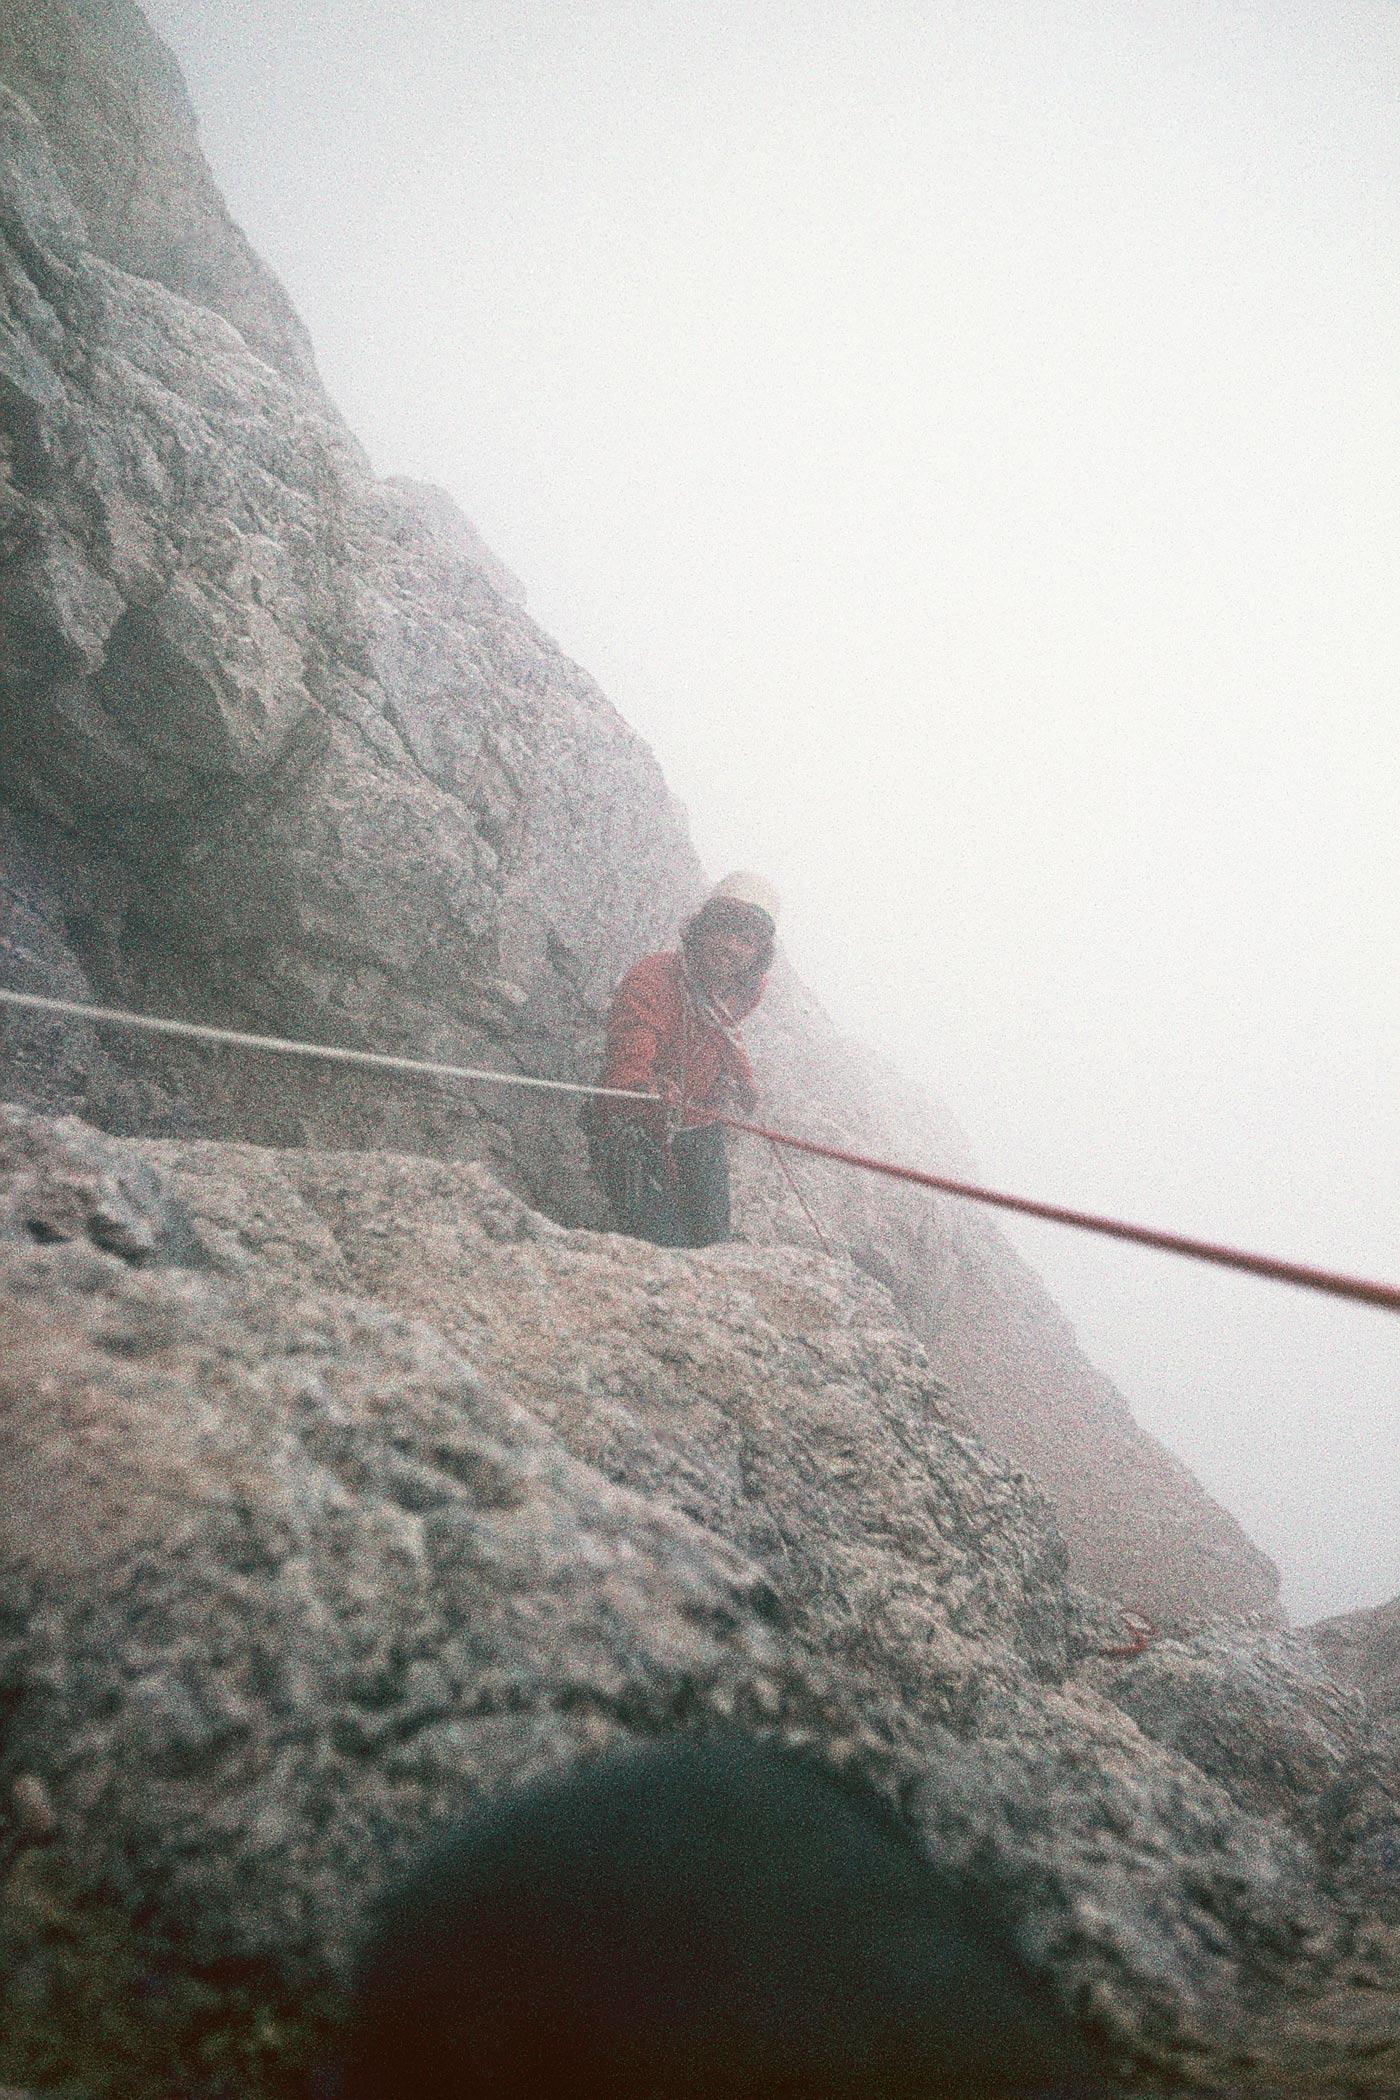 Schlechtwetter am Pelmo. Abseilen zum Biwakplatz. Foto: Archiv Messner I bergundsteigen.blog